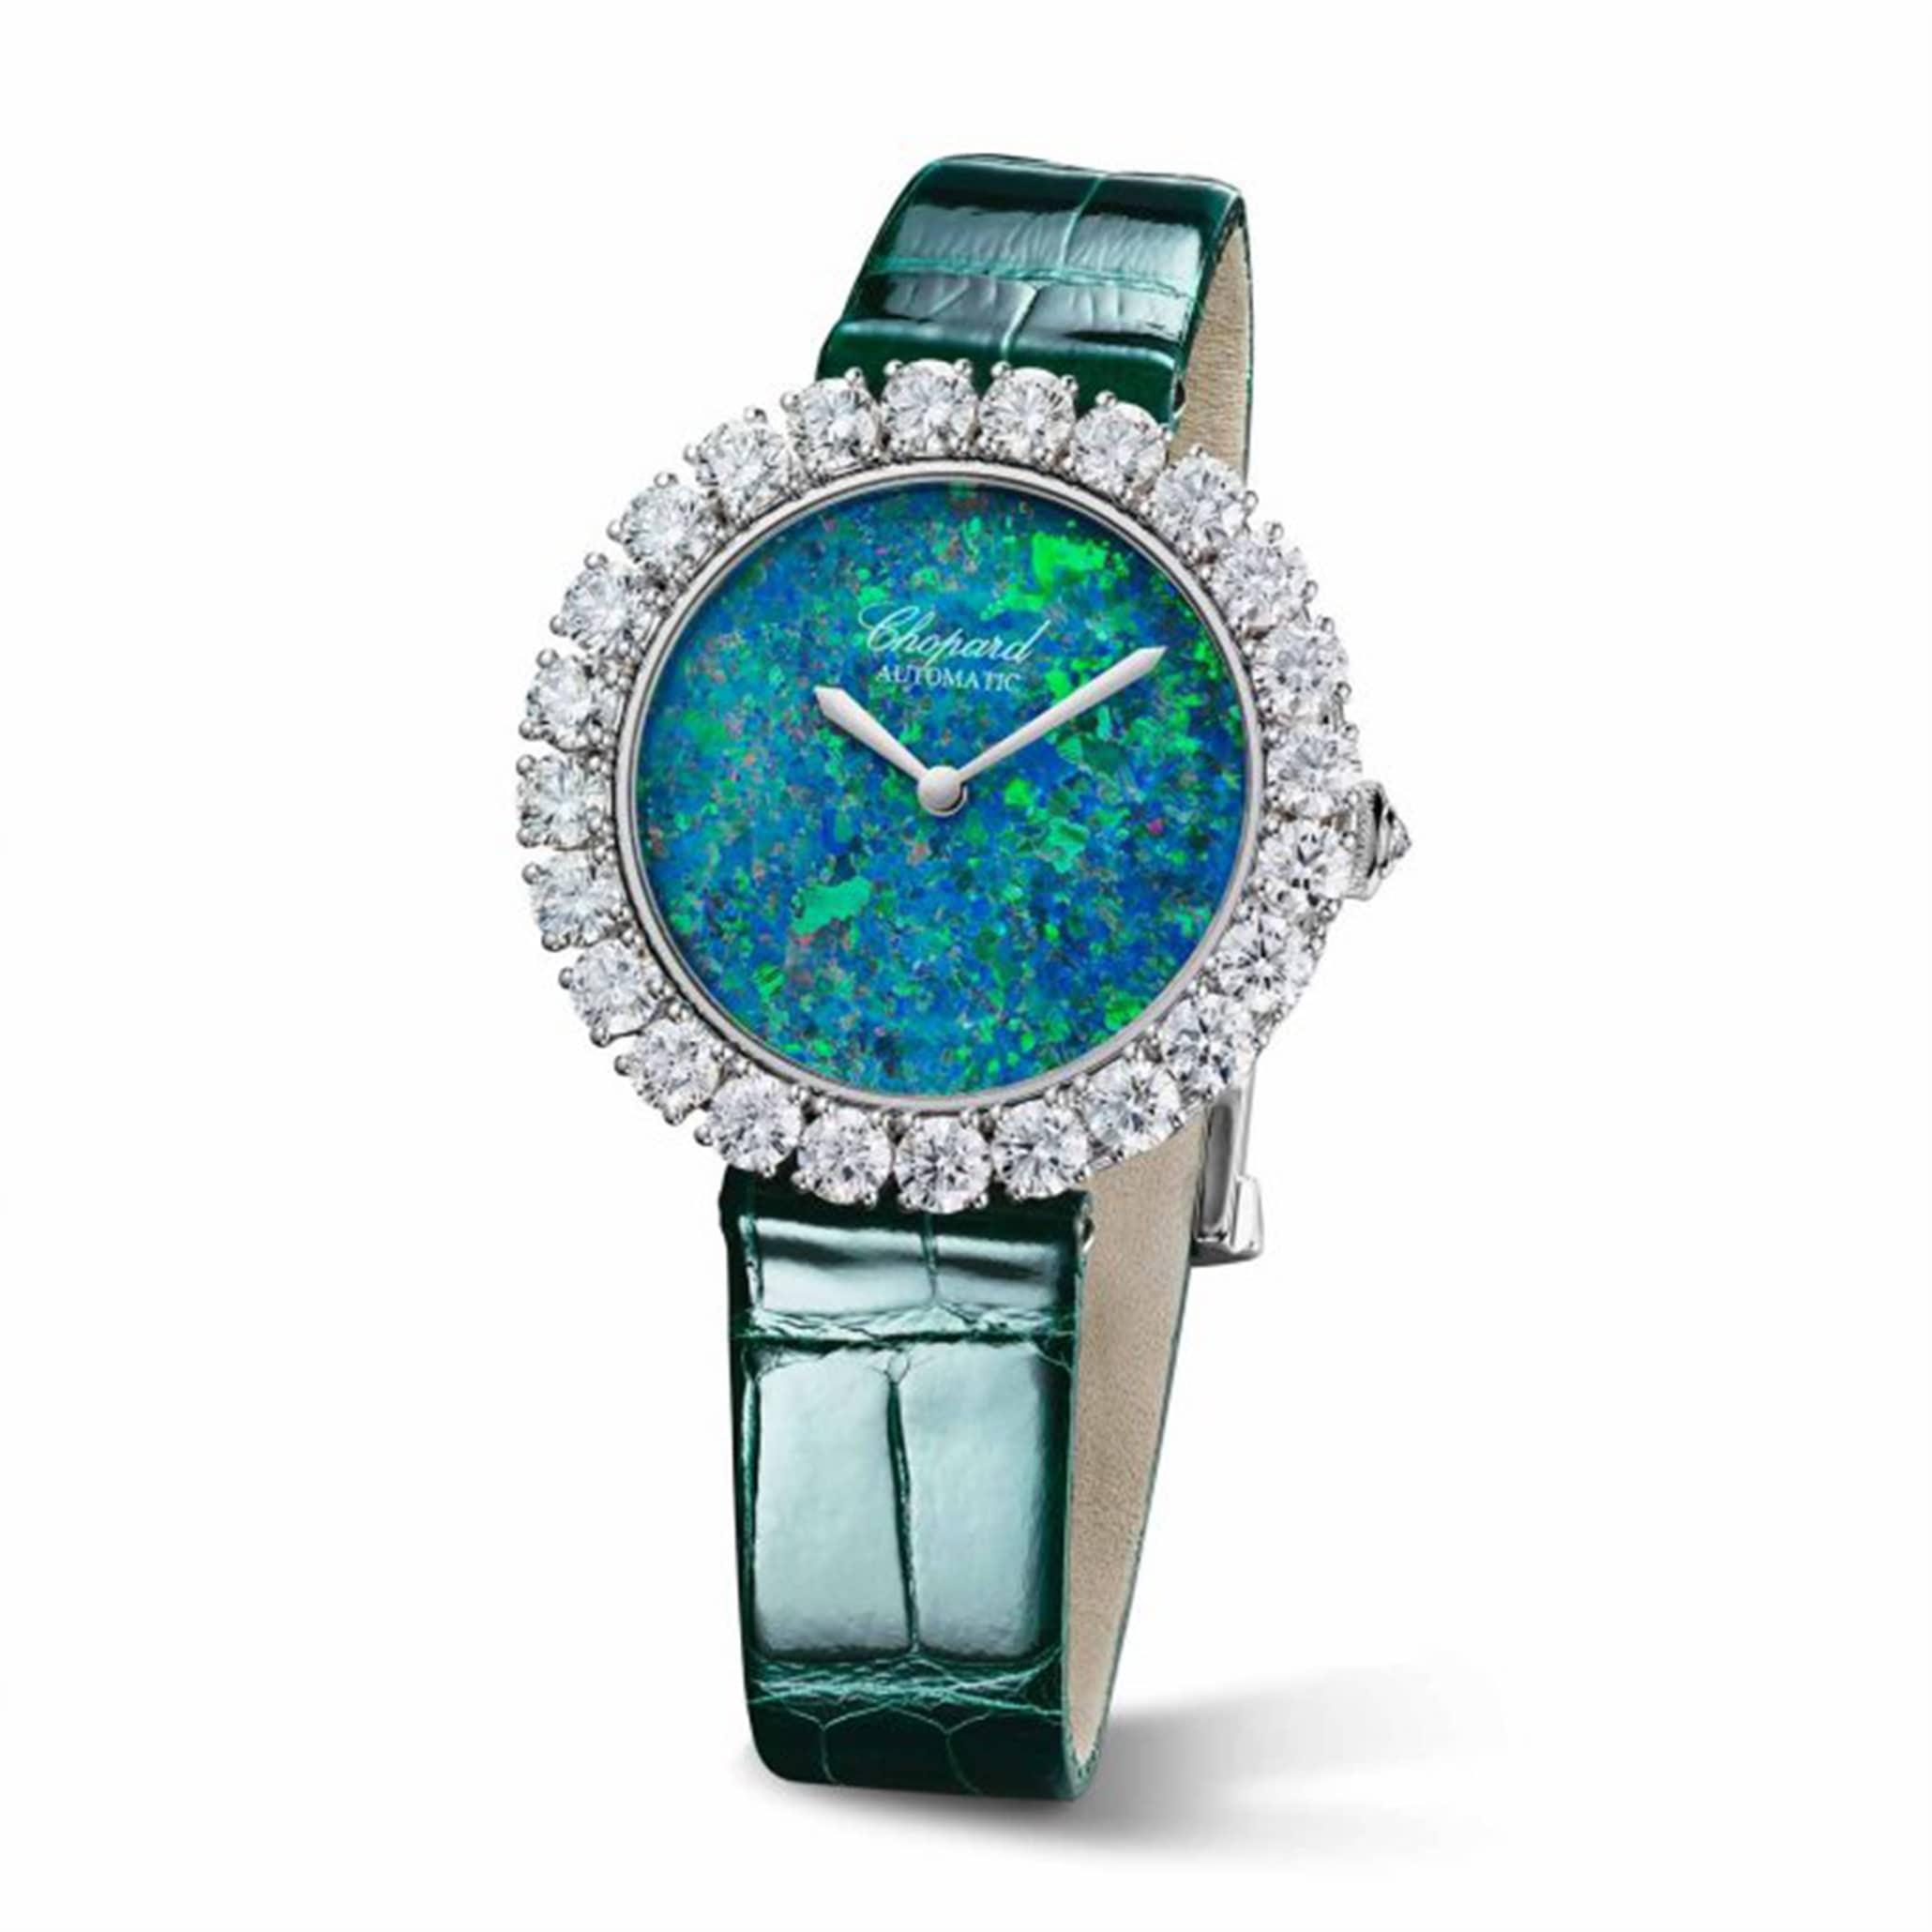 The third Chopard L'Heure du Diamant timepiece